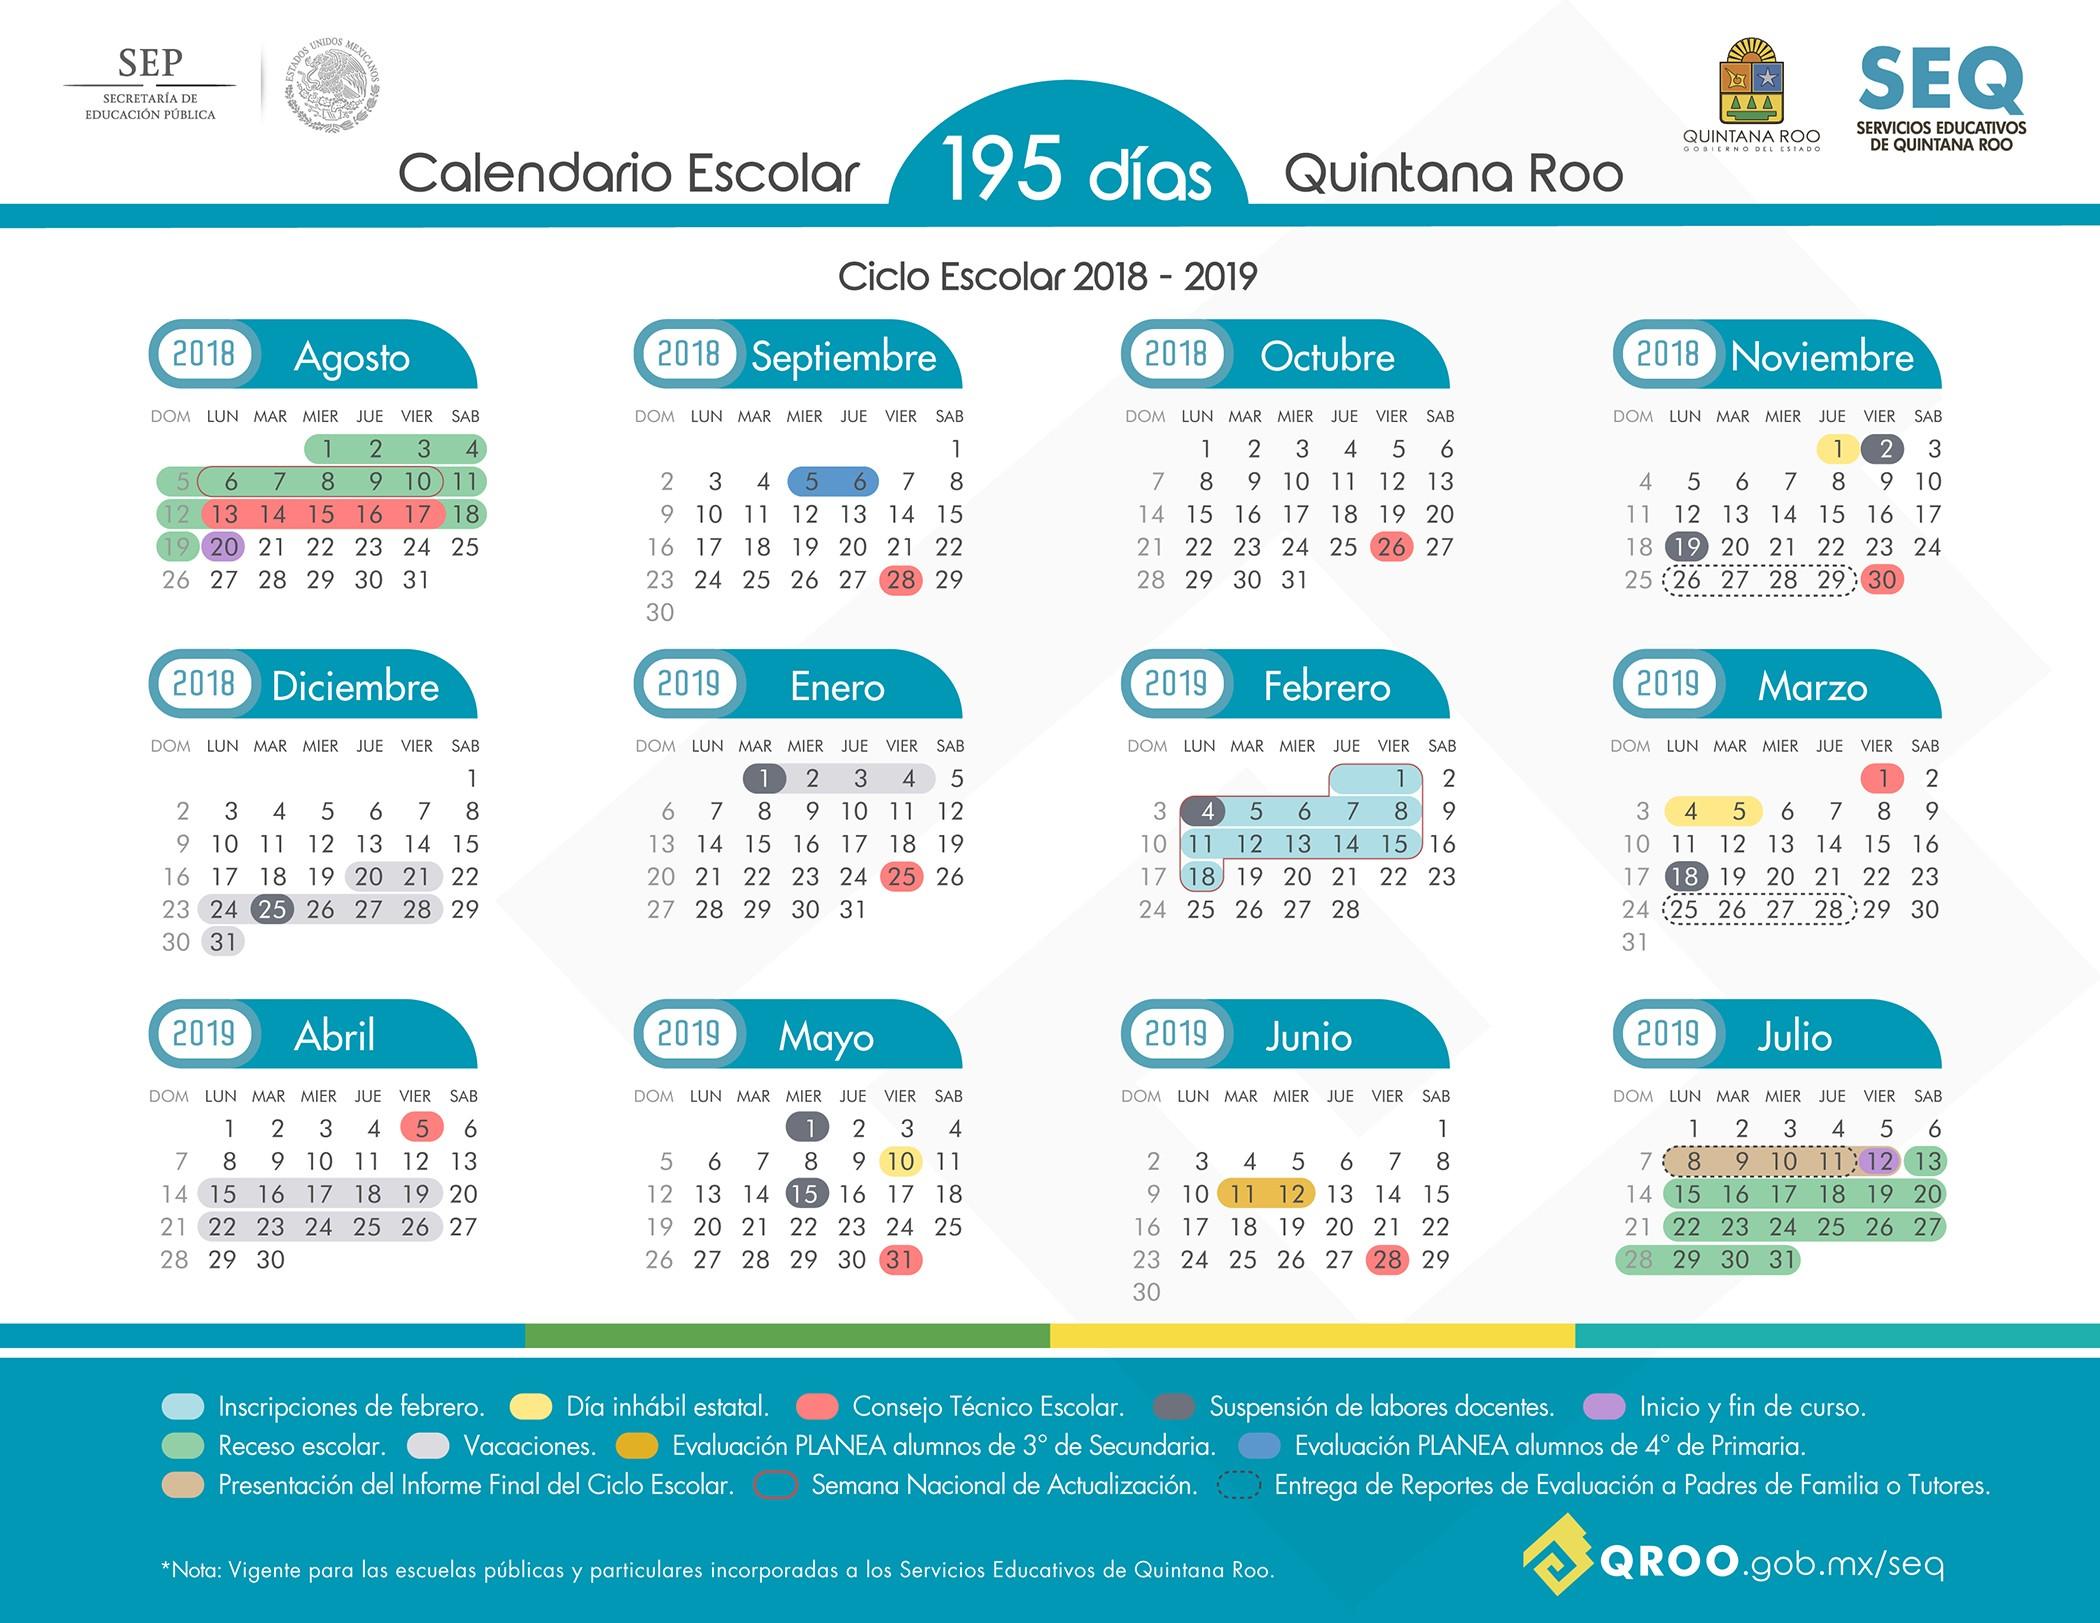 Calendario Imprimir Semanas Más Actual Calendario Escolar 2018 2019 Of Calendario Imprimir Semanas Más Reciente Calendario Académico